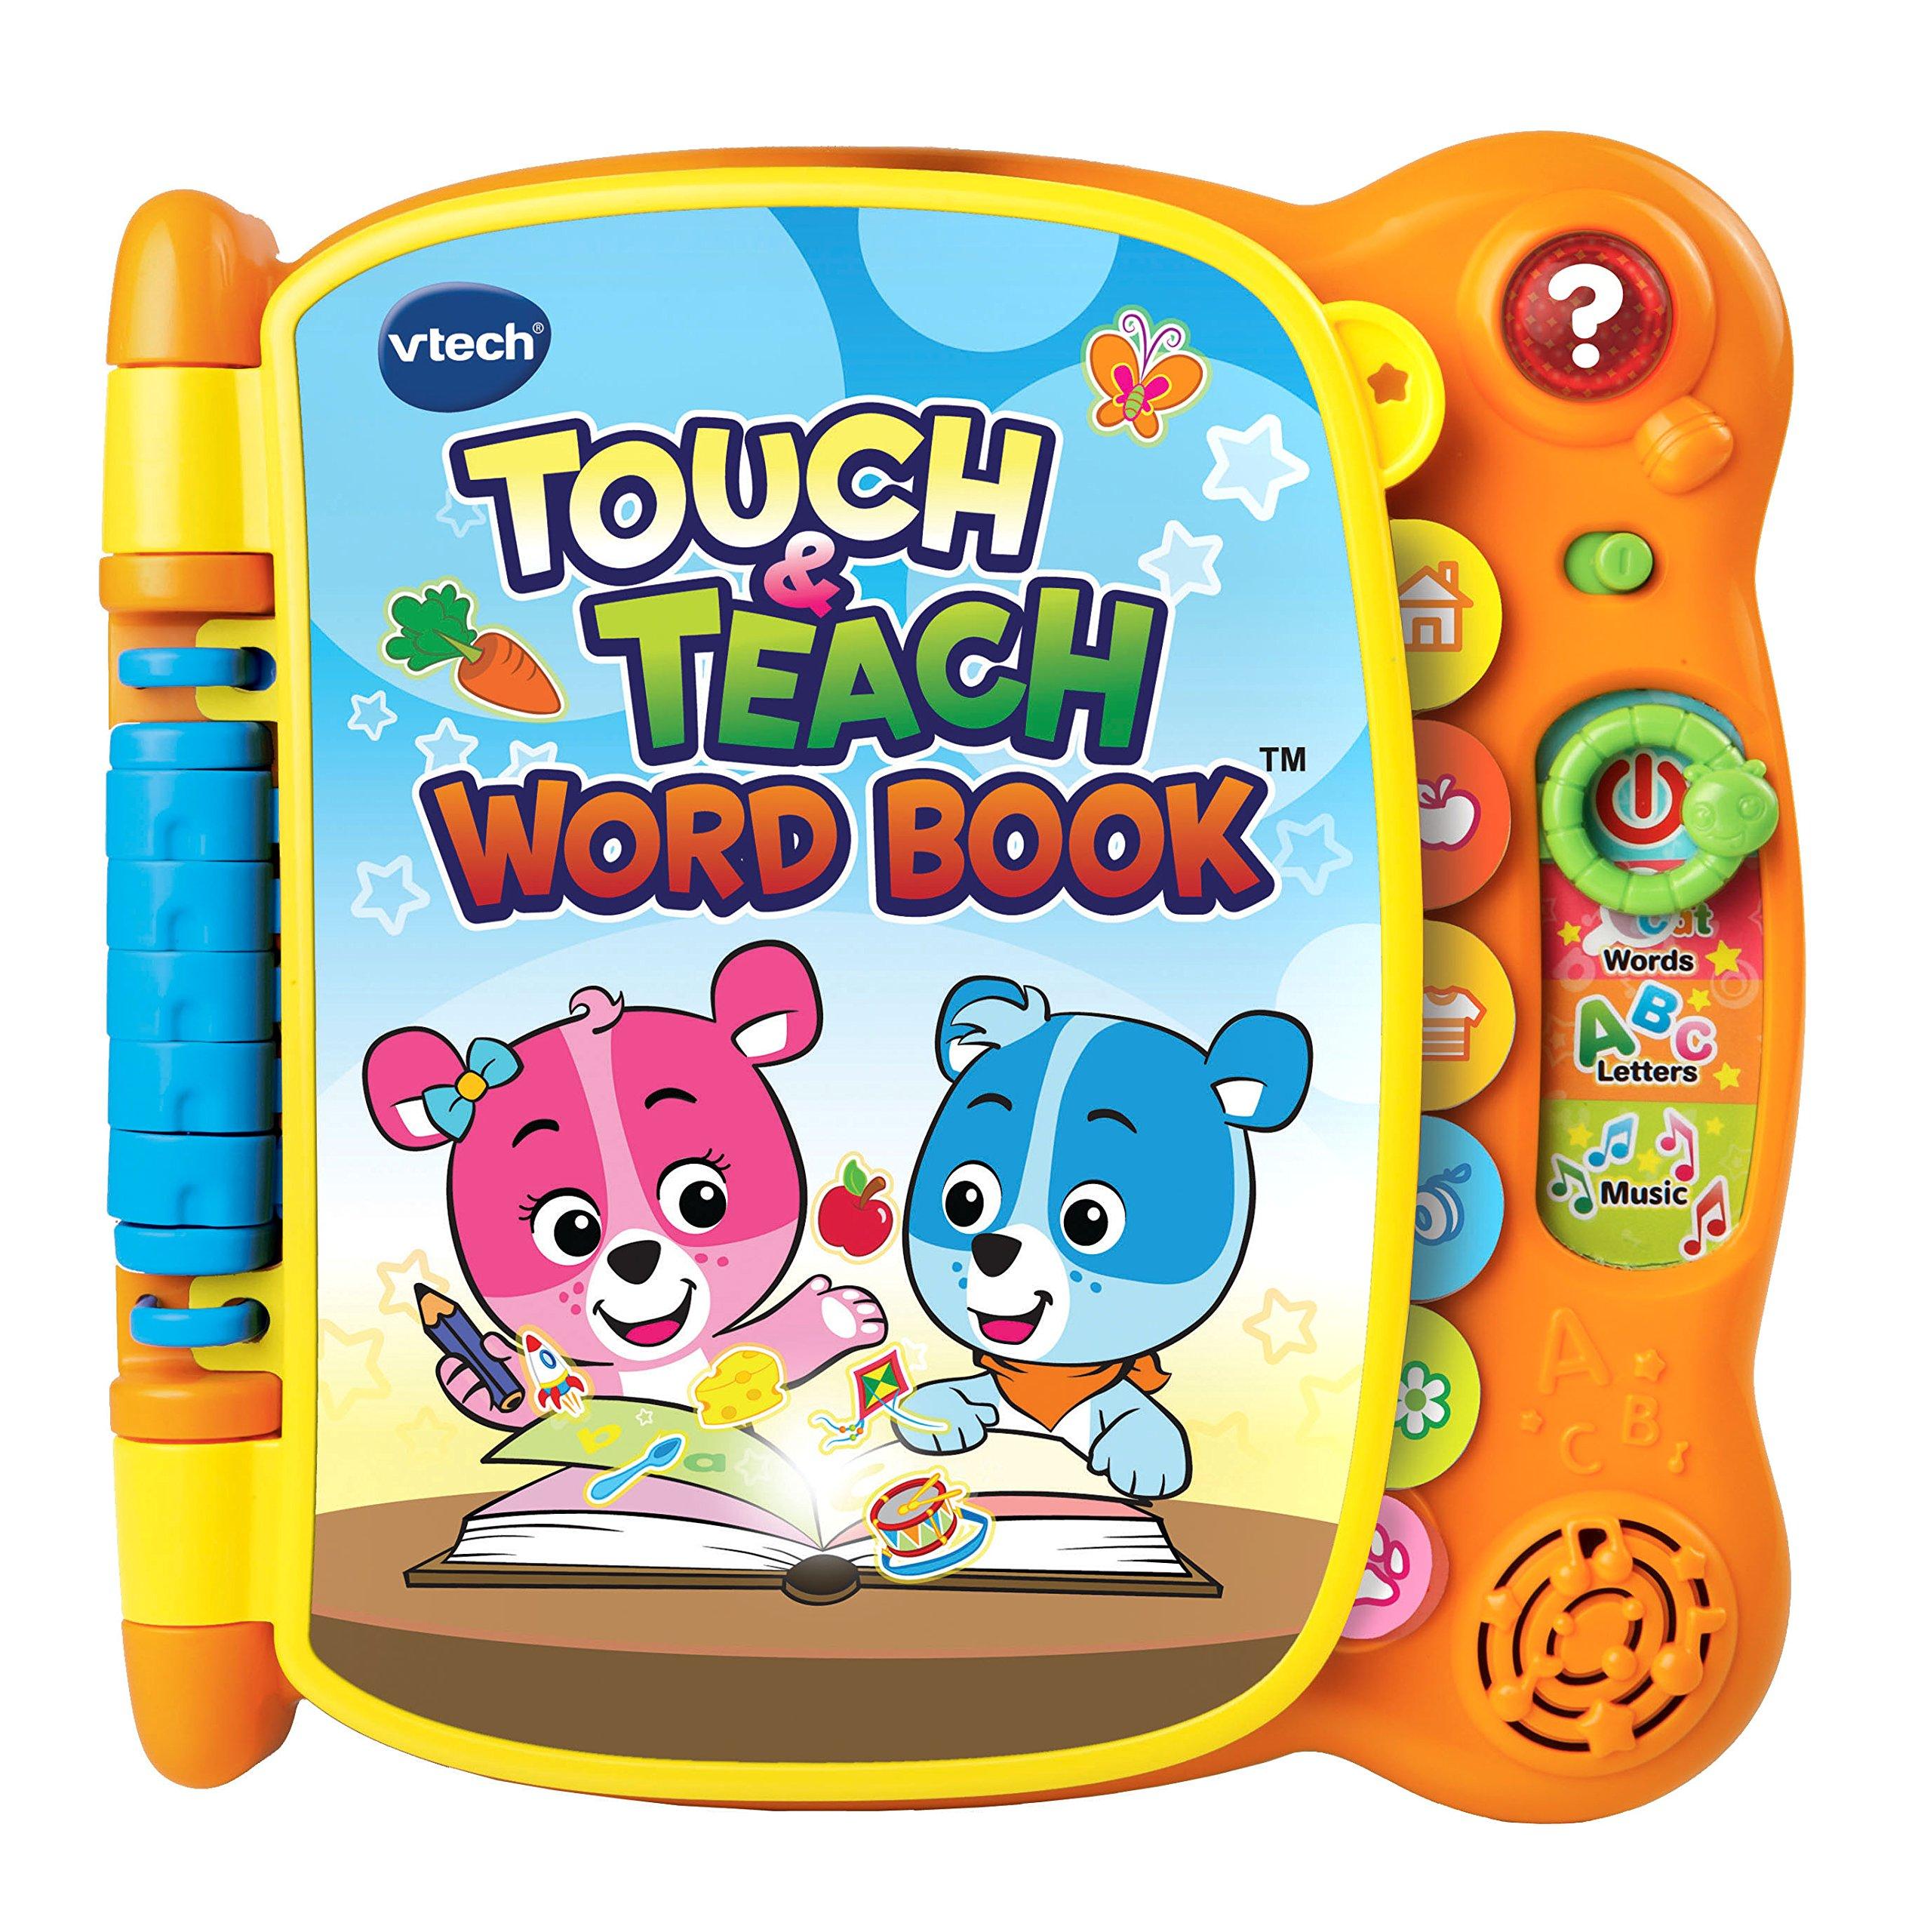 VTech Touch Teach Frustration Packaging